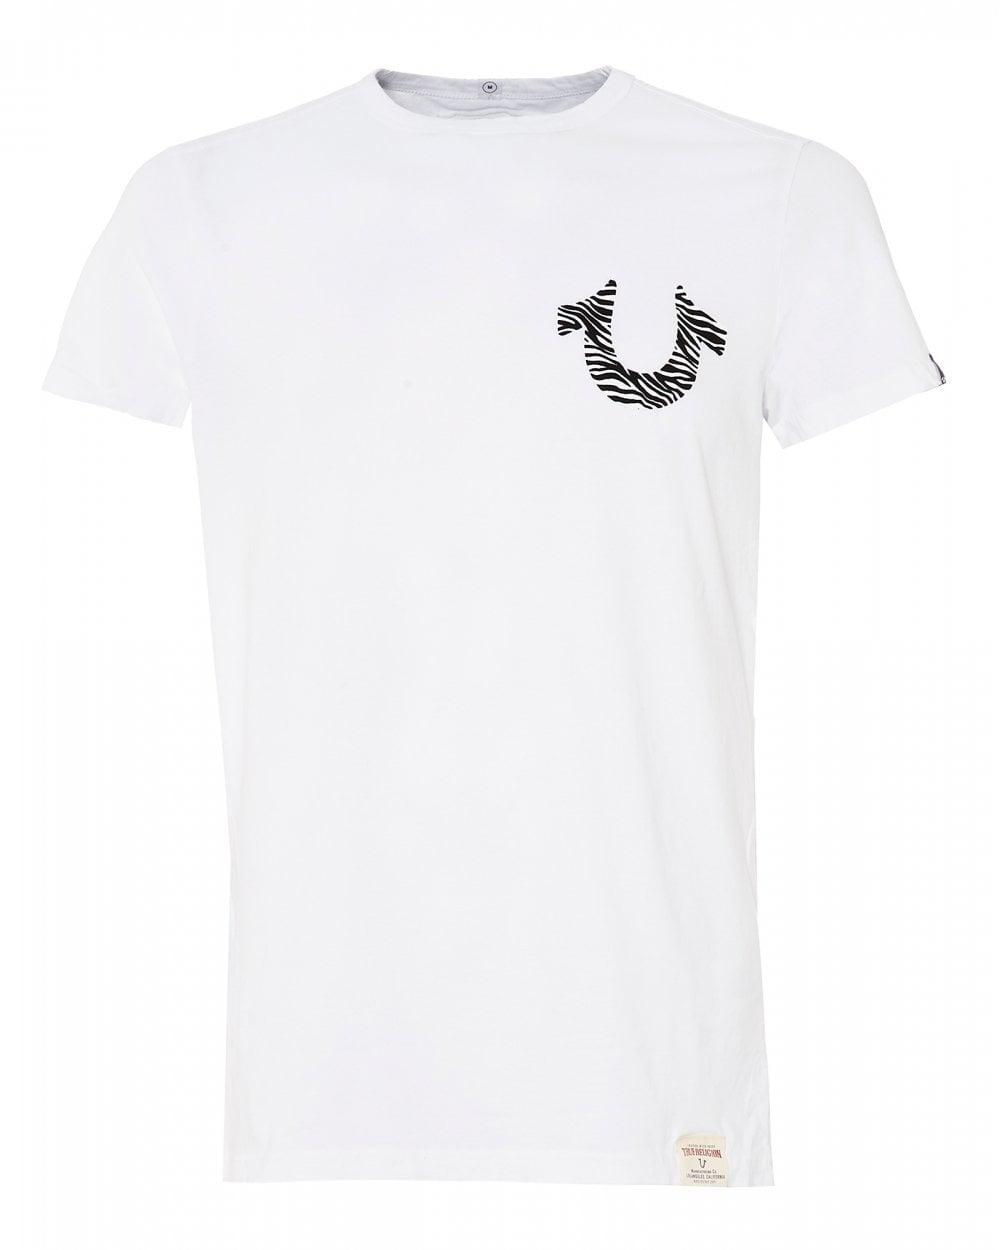 21b40313 True Religion Mens Zebra Horseshoe Logo T-Shirt, White Tee